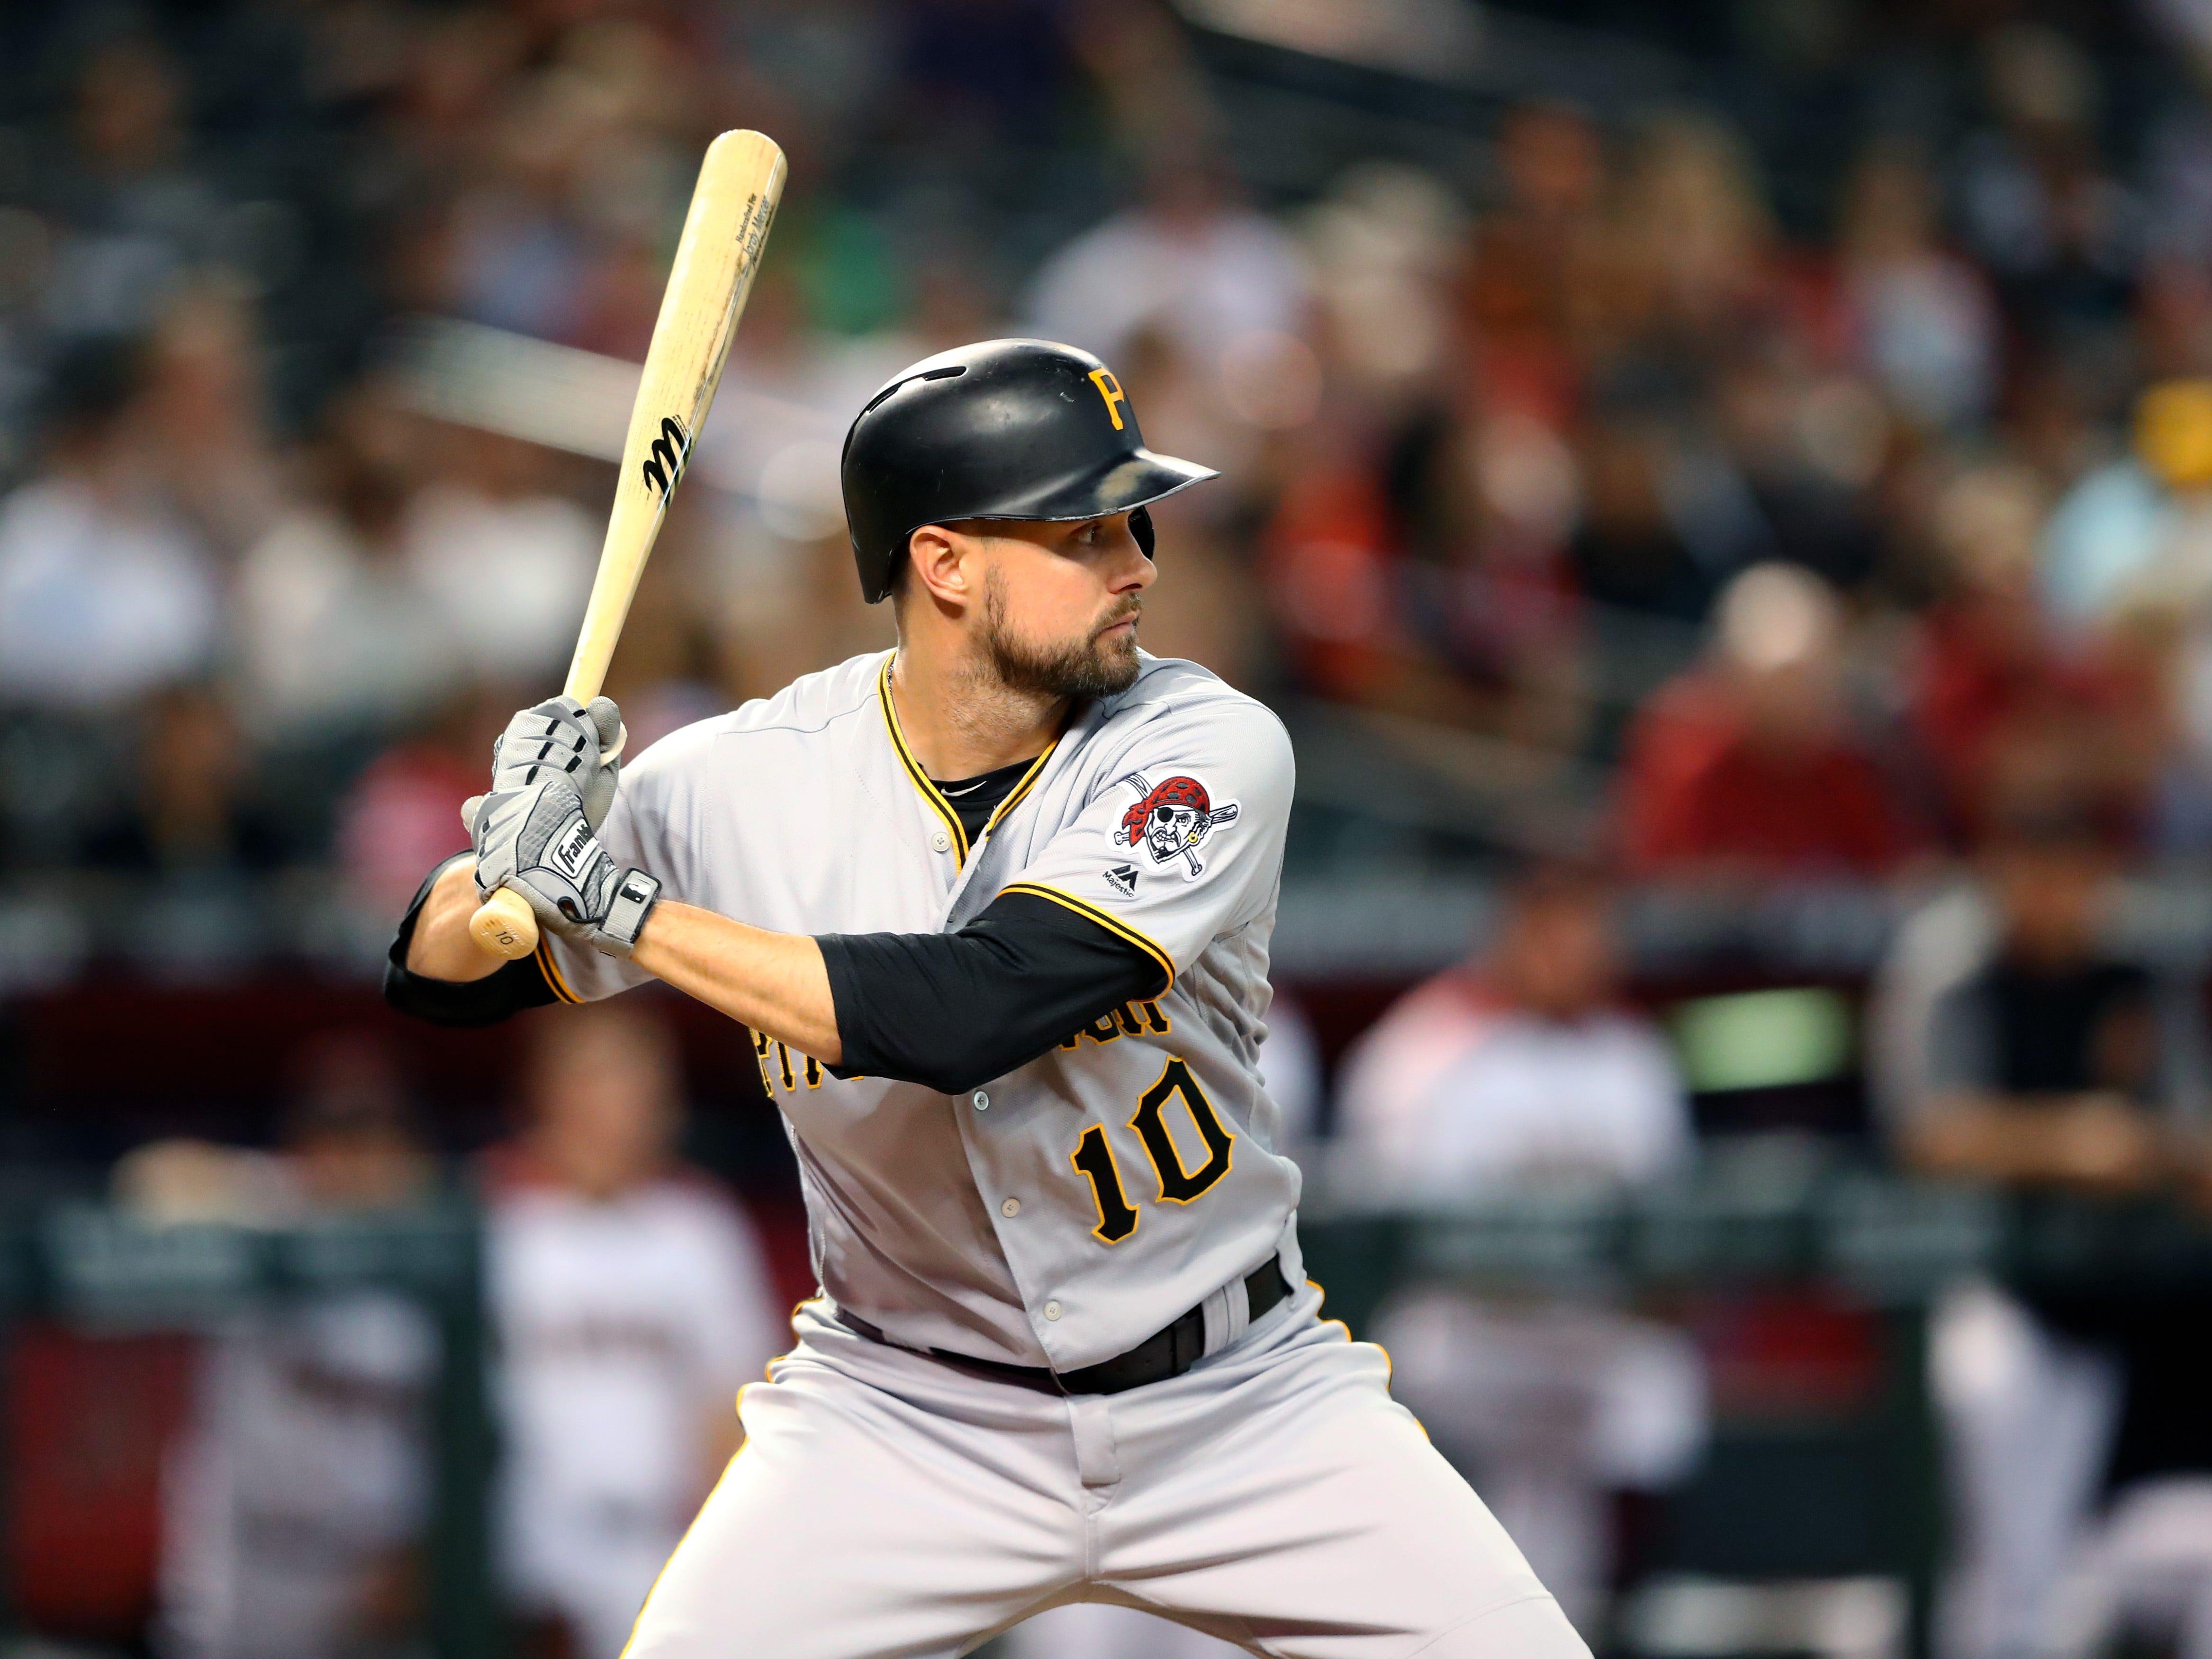 Pittsburgh Pirates shortstop Jordy Mercer bats against the Arizona Diamondbacks at Chase Field, June 13, 2018.